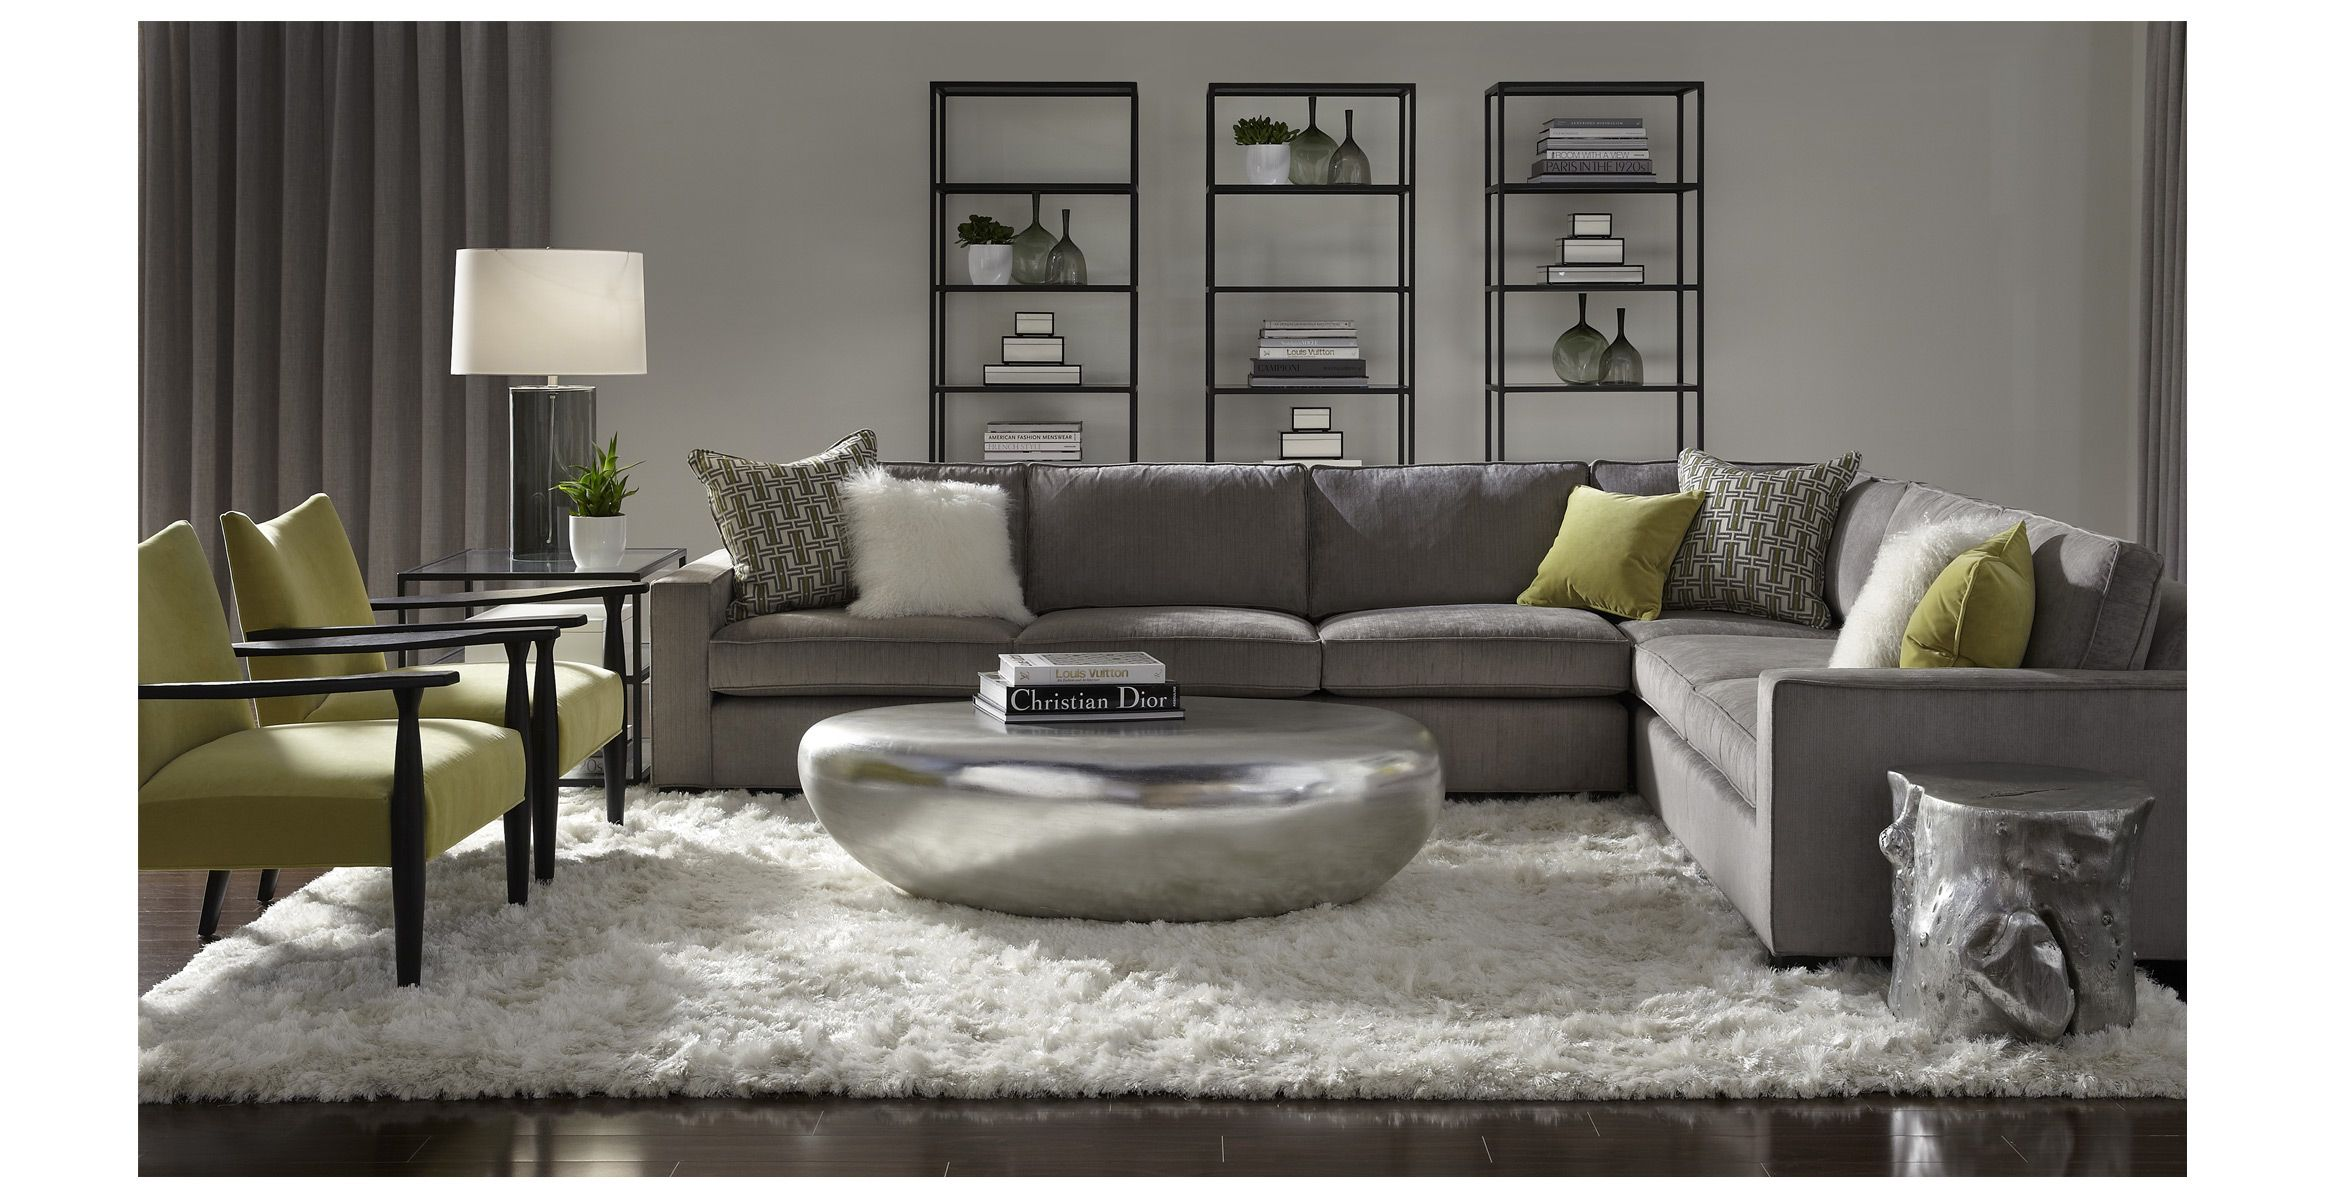 mitchell gold sectional sofa london rattan corner set grey 43 bob williams carson slate gray